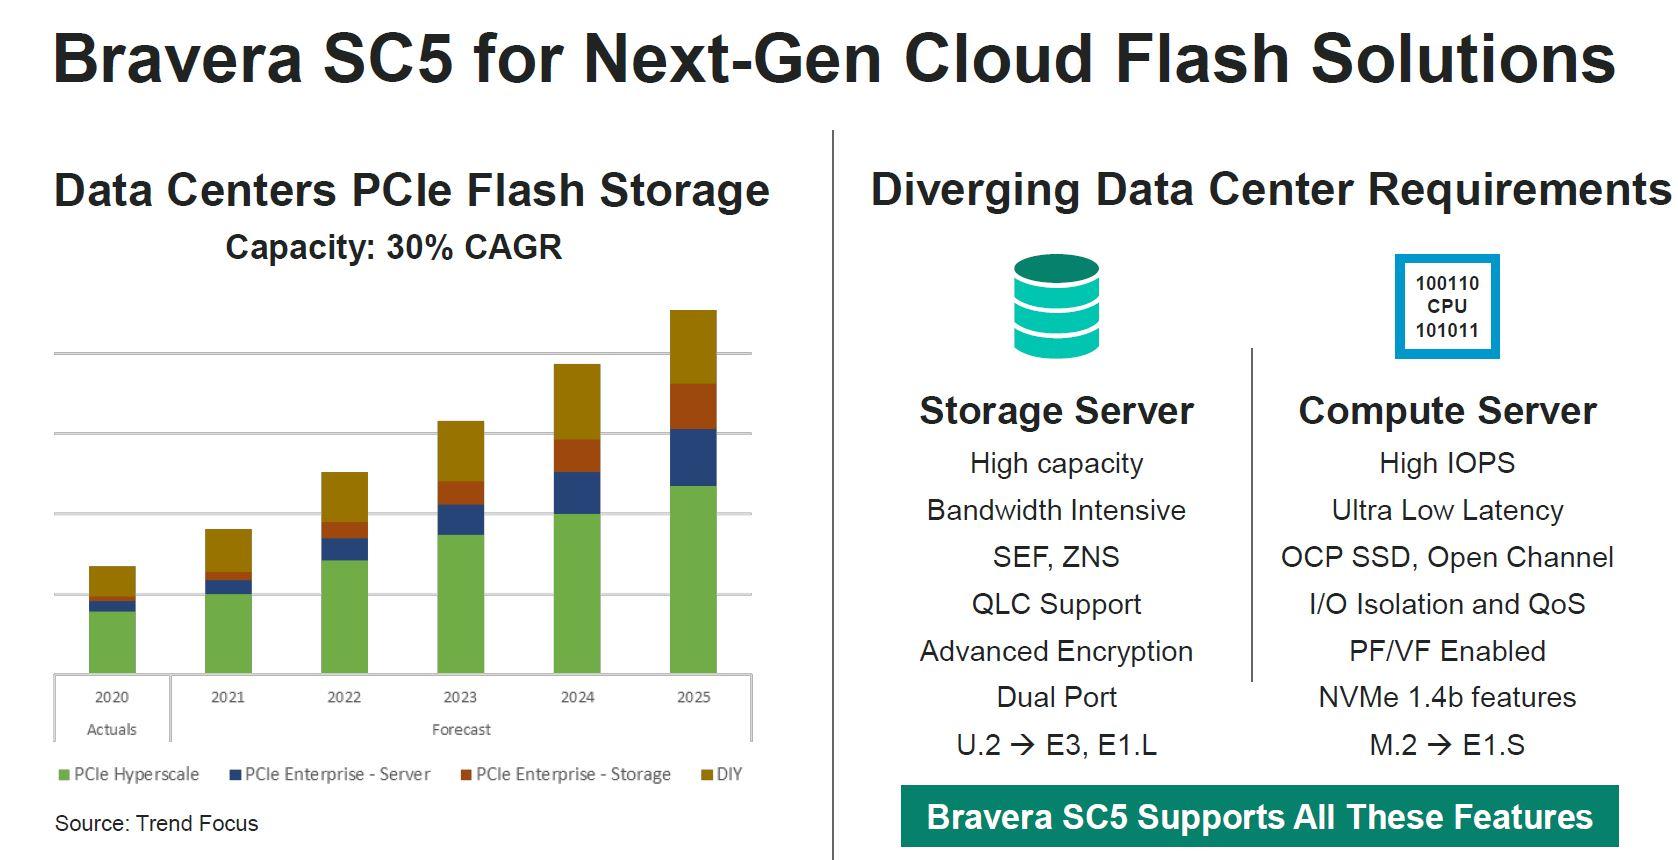 Marvell Bravera SC5 Cloud Flash